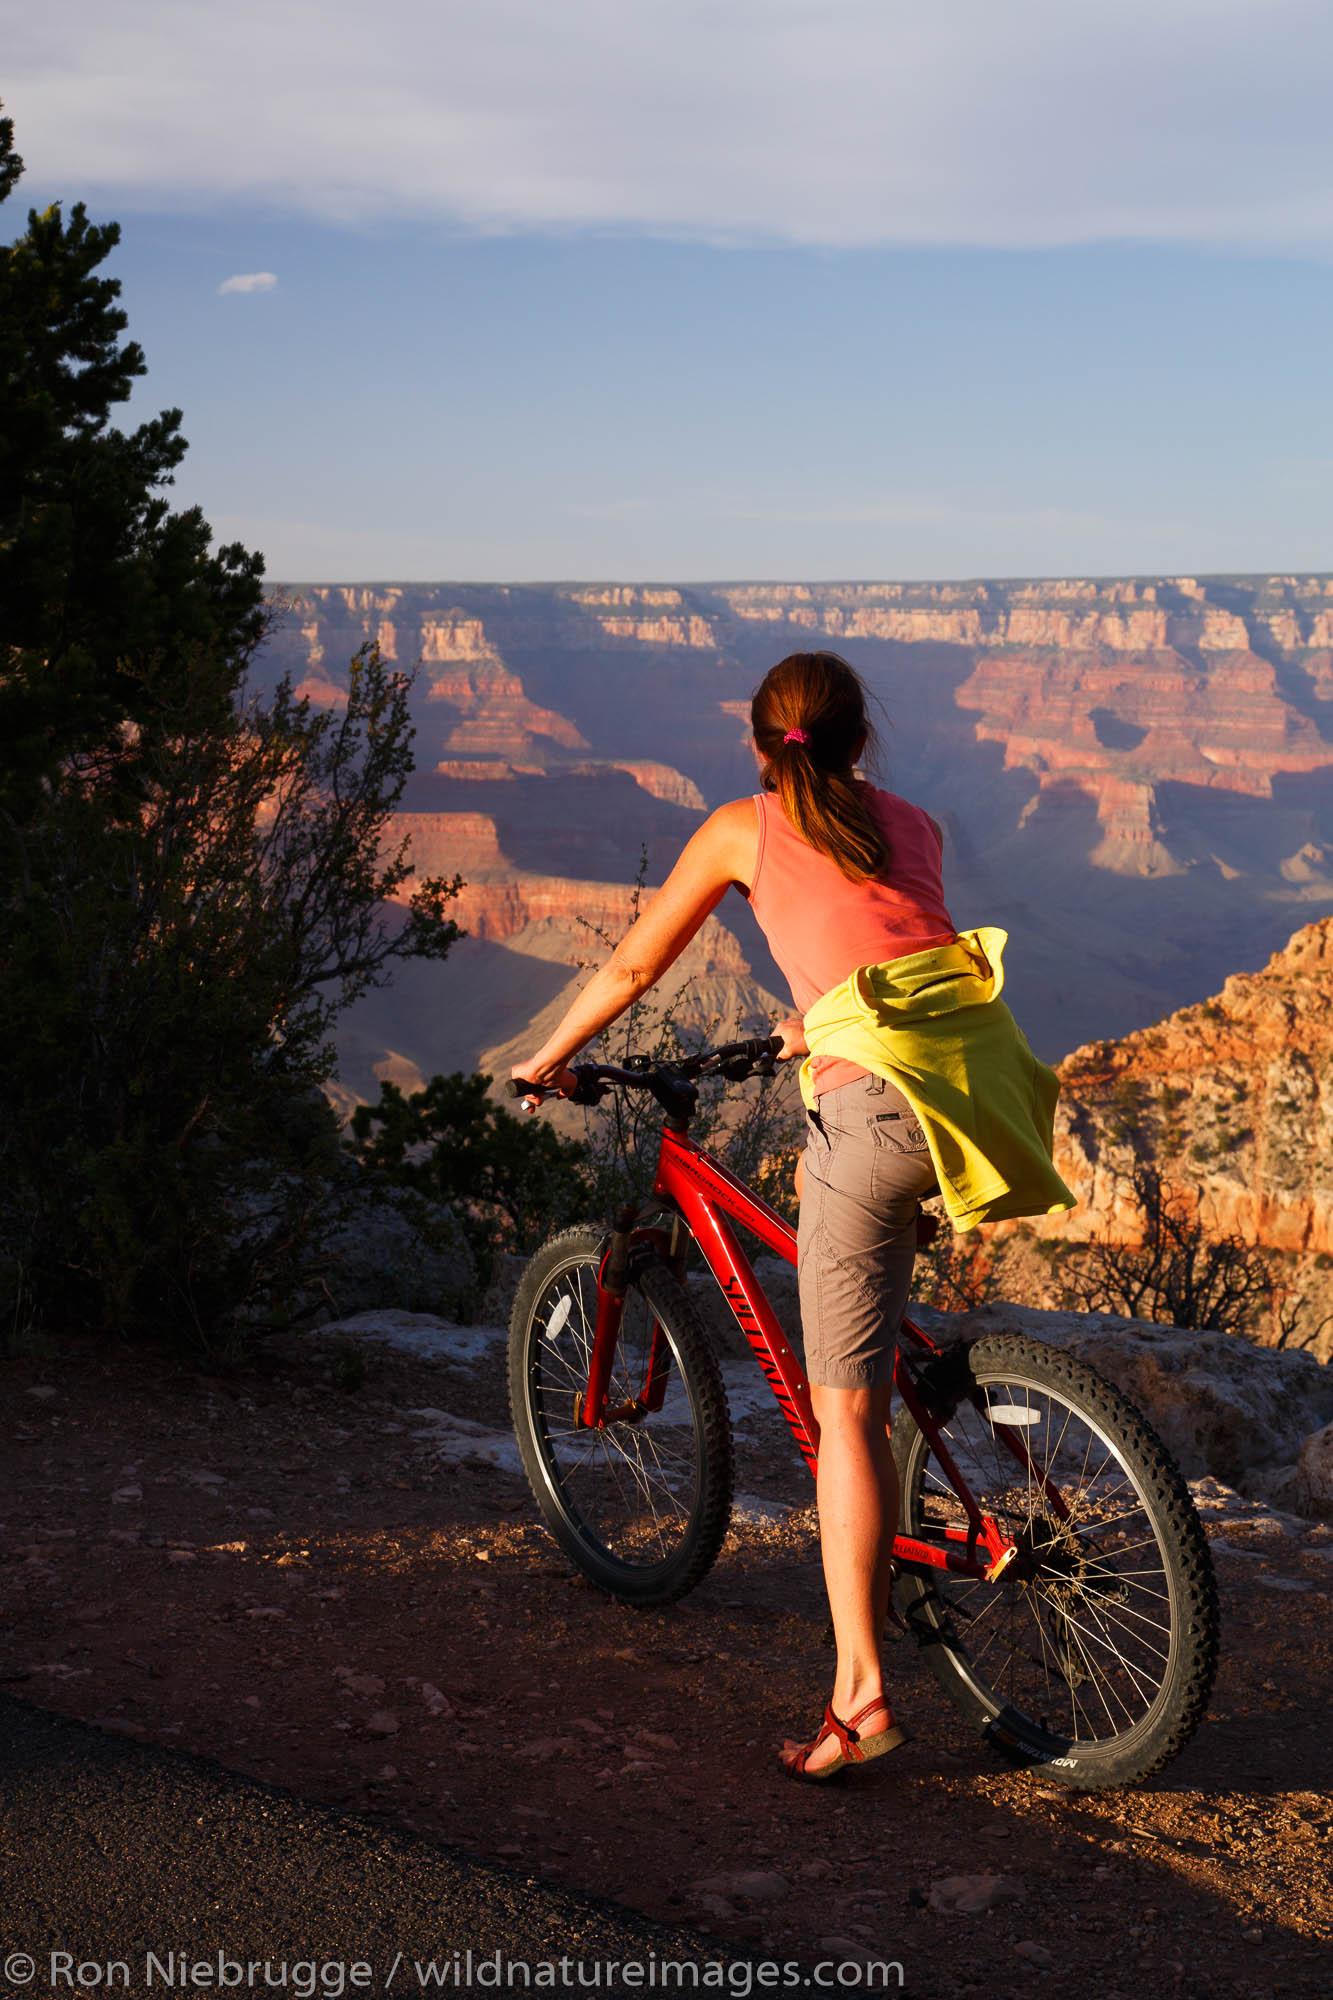 Biking the Rim Trail, Grand Canyon National Park, Arizona. (model released)